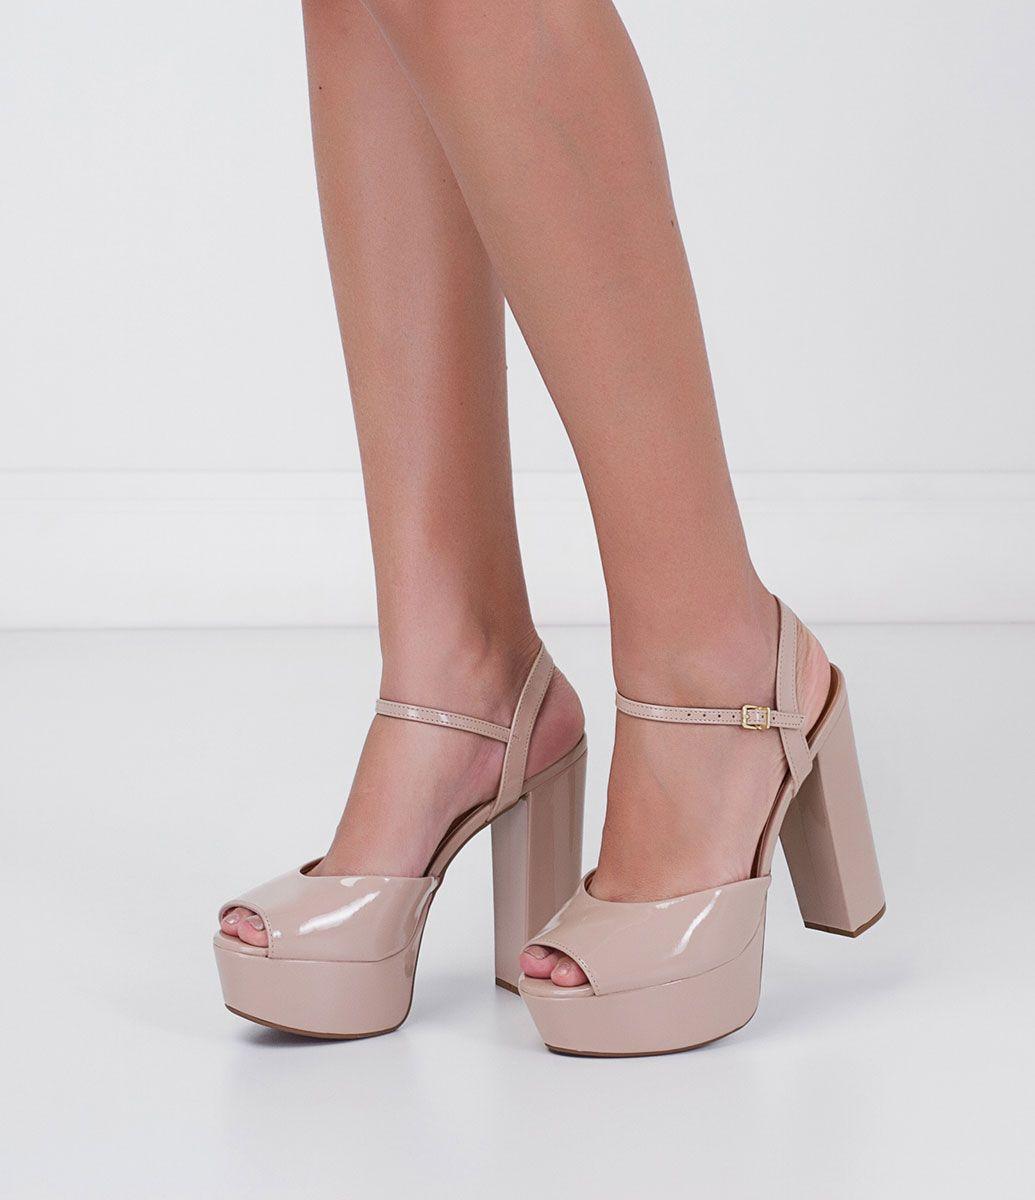 Cheap Melissa Shoes